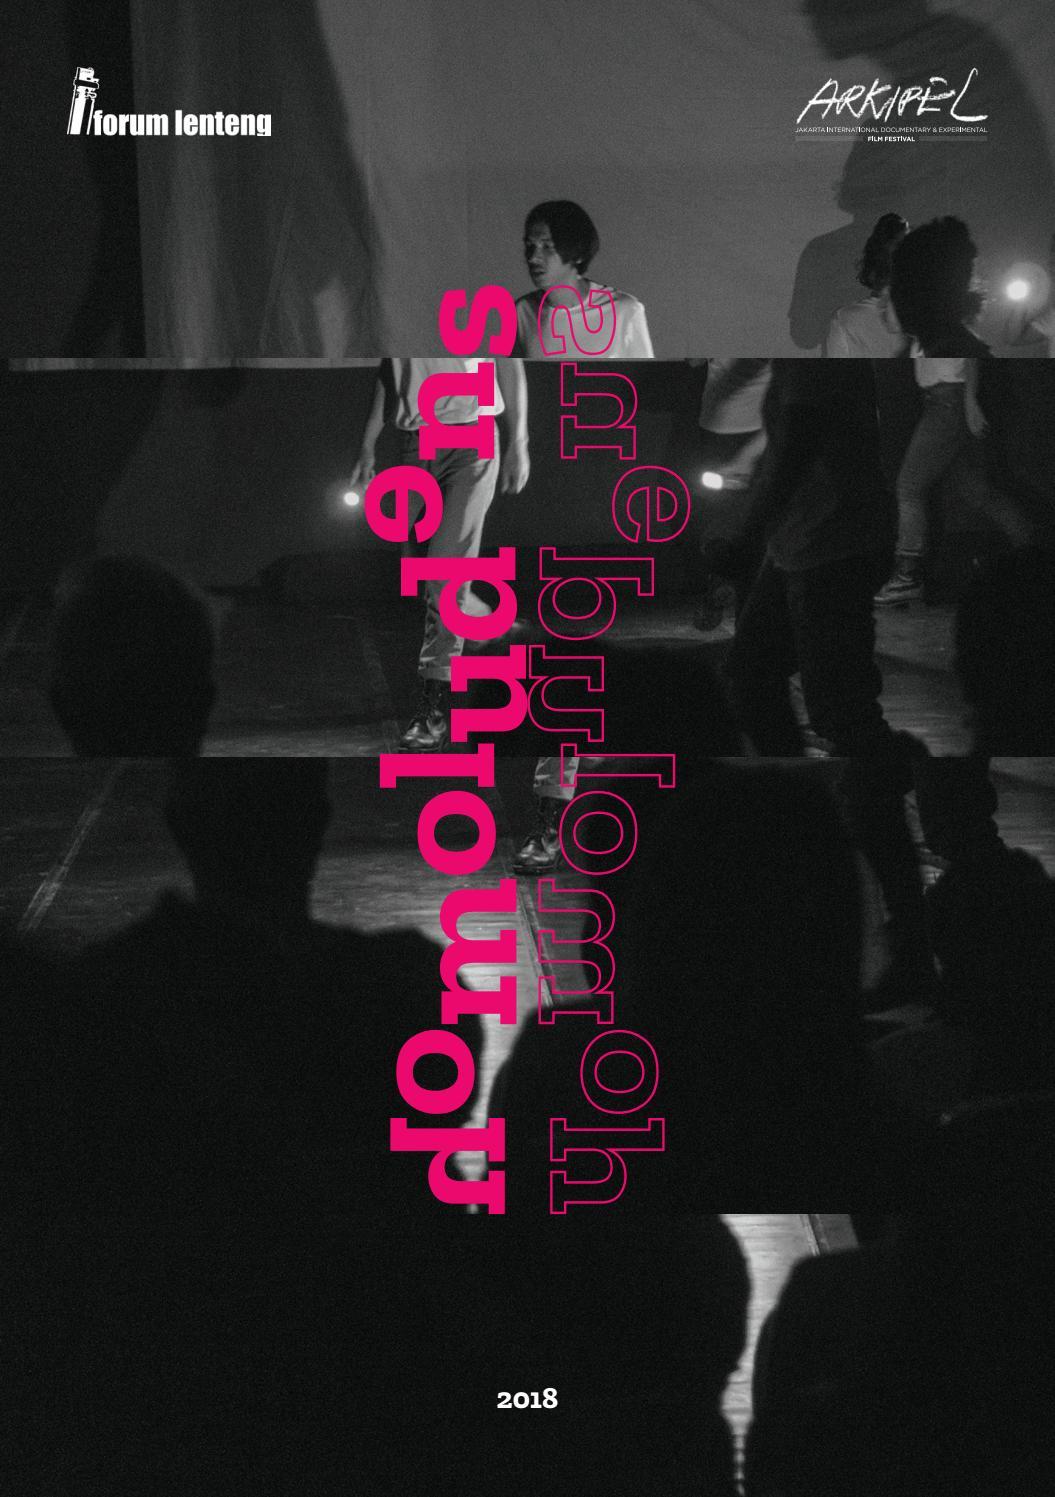 Arkipel Homoludens 6th Jakarta International Documentary And Experimental Film Festival By Forum Lenteng Issuu